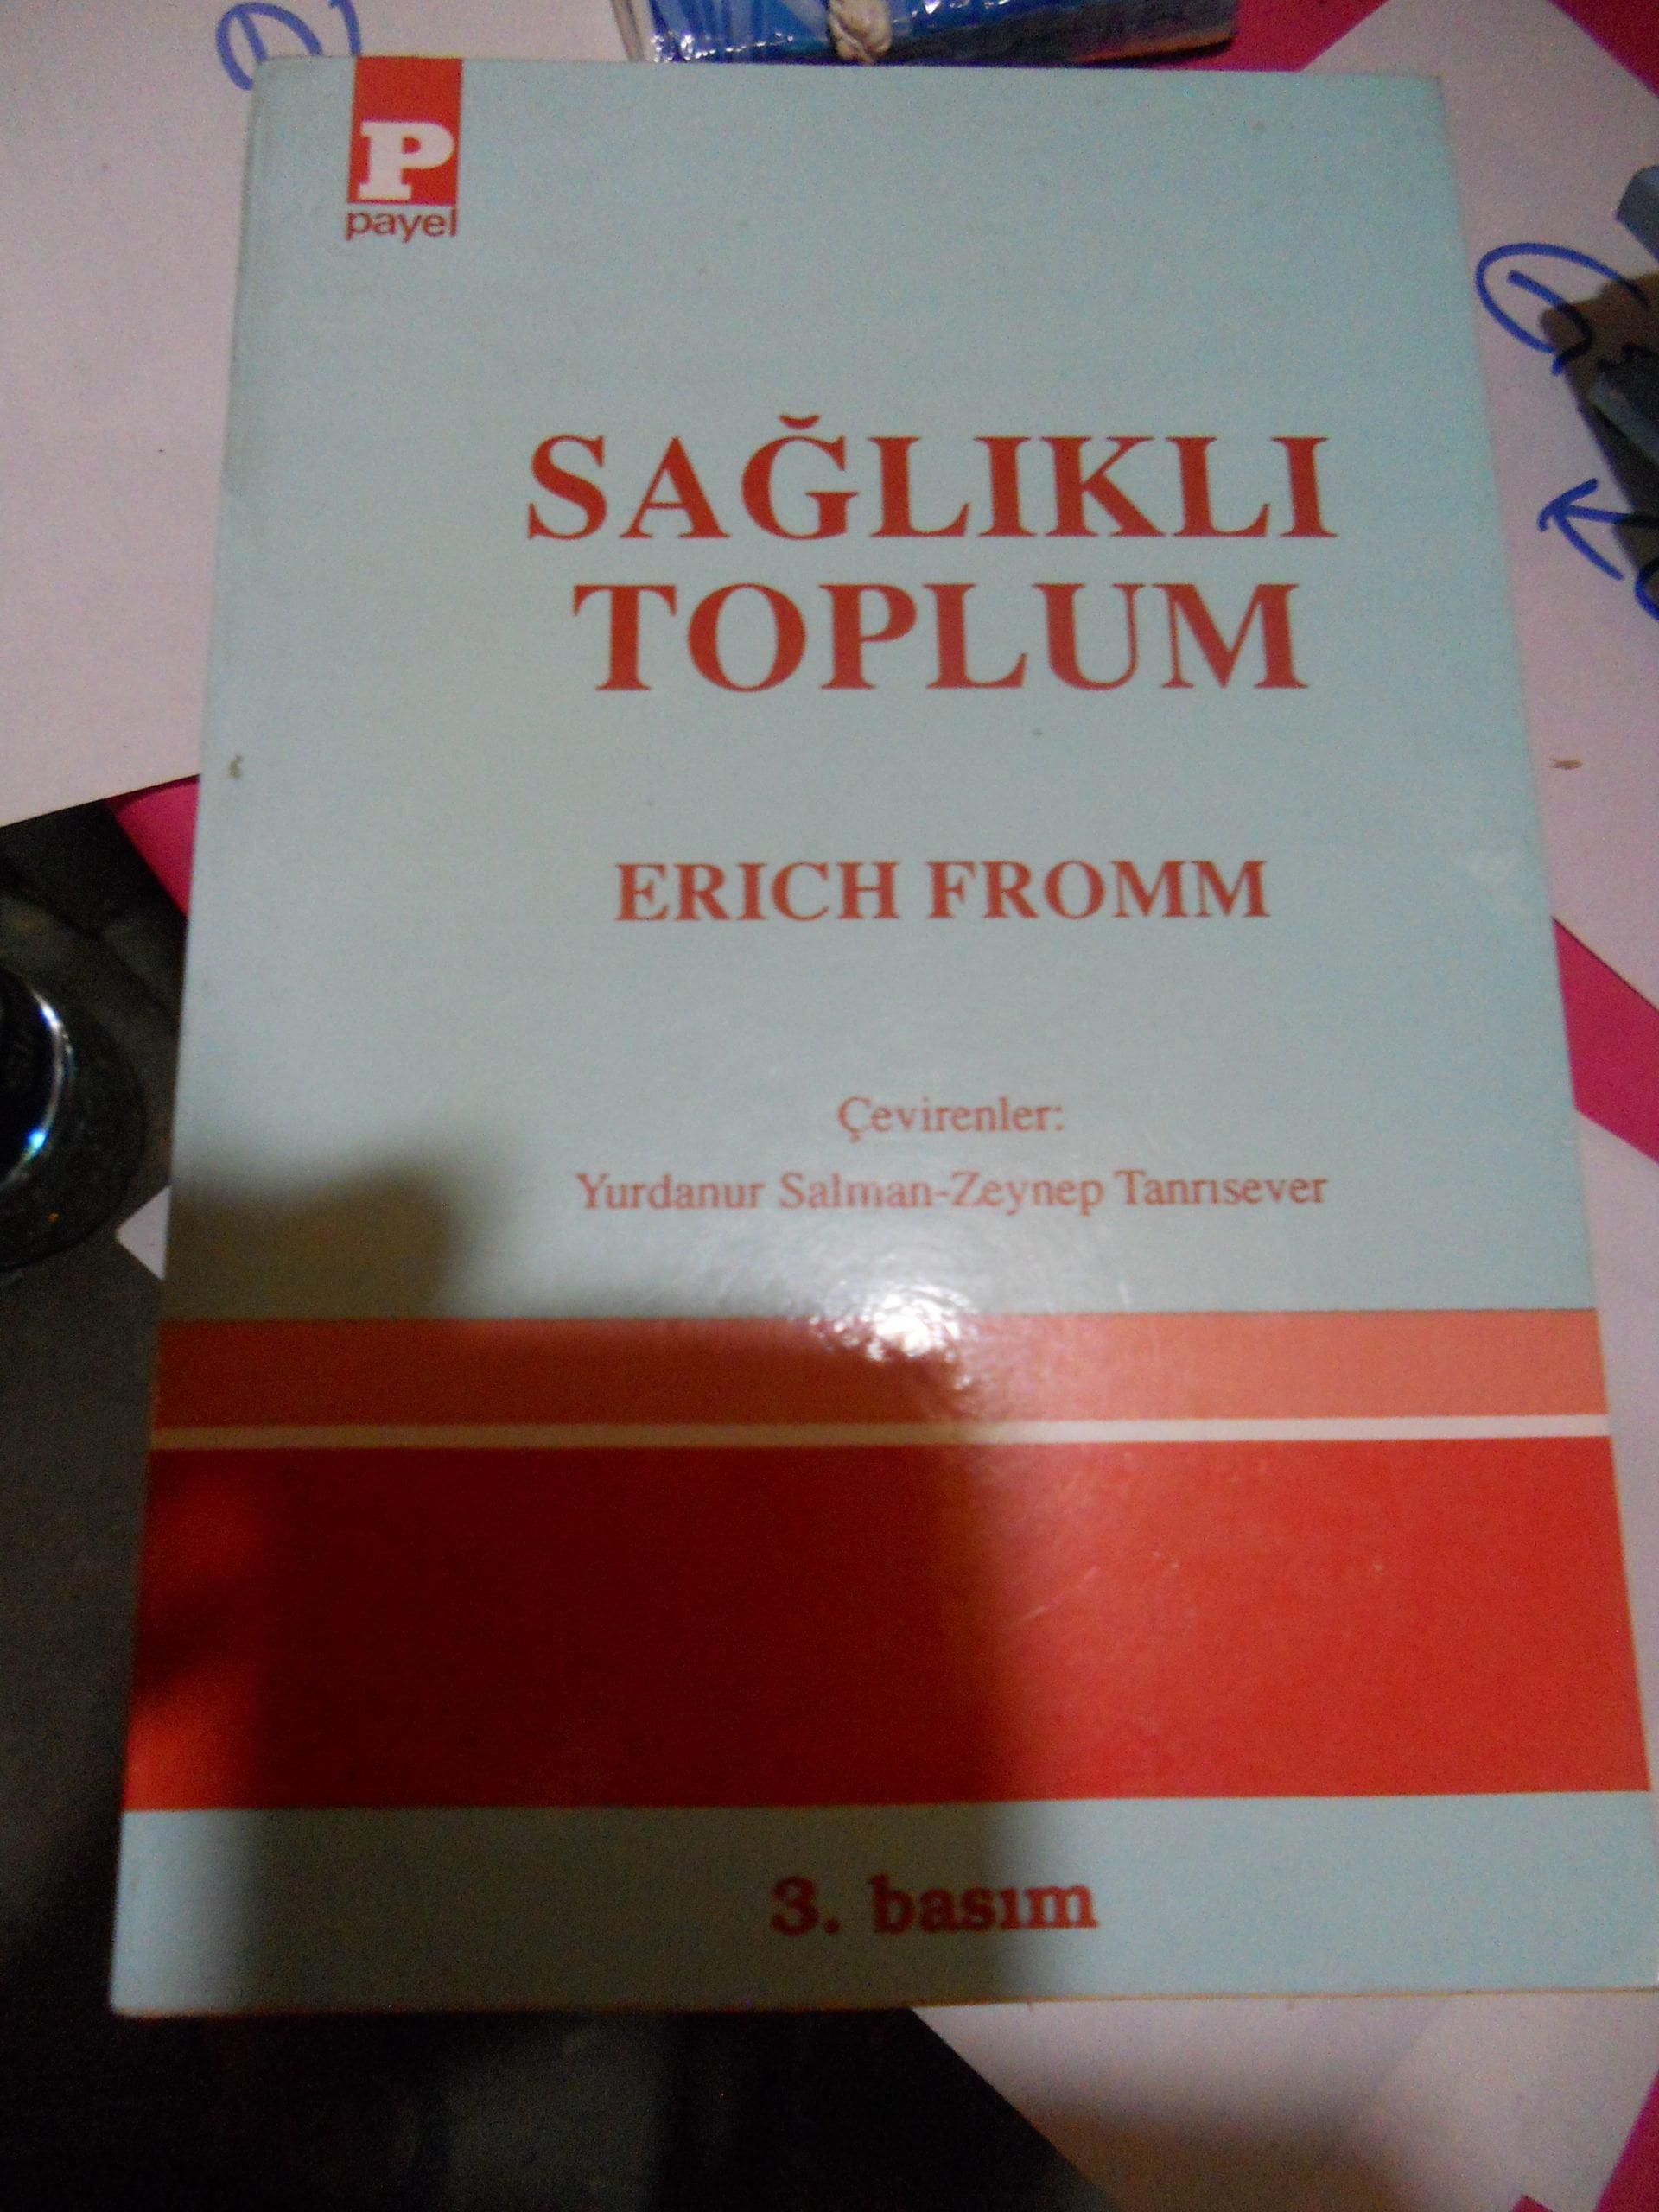 SAĞLIKLI TOPLUM/ERICH FROMM/15 TL